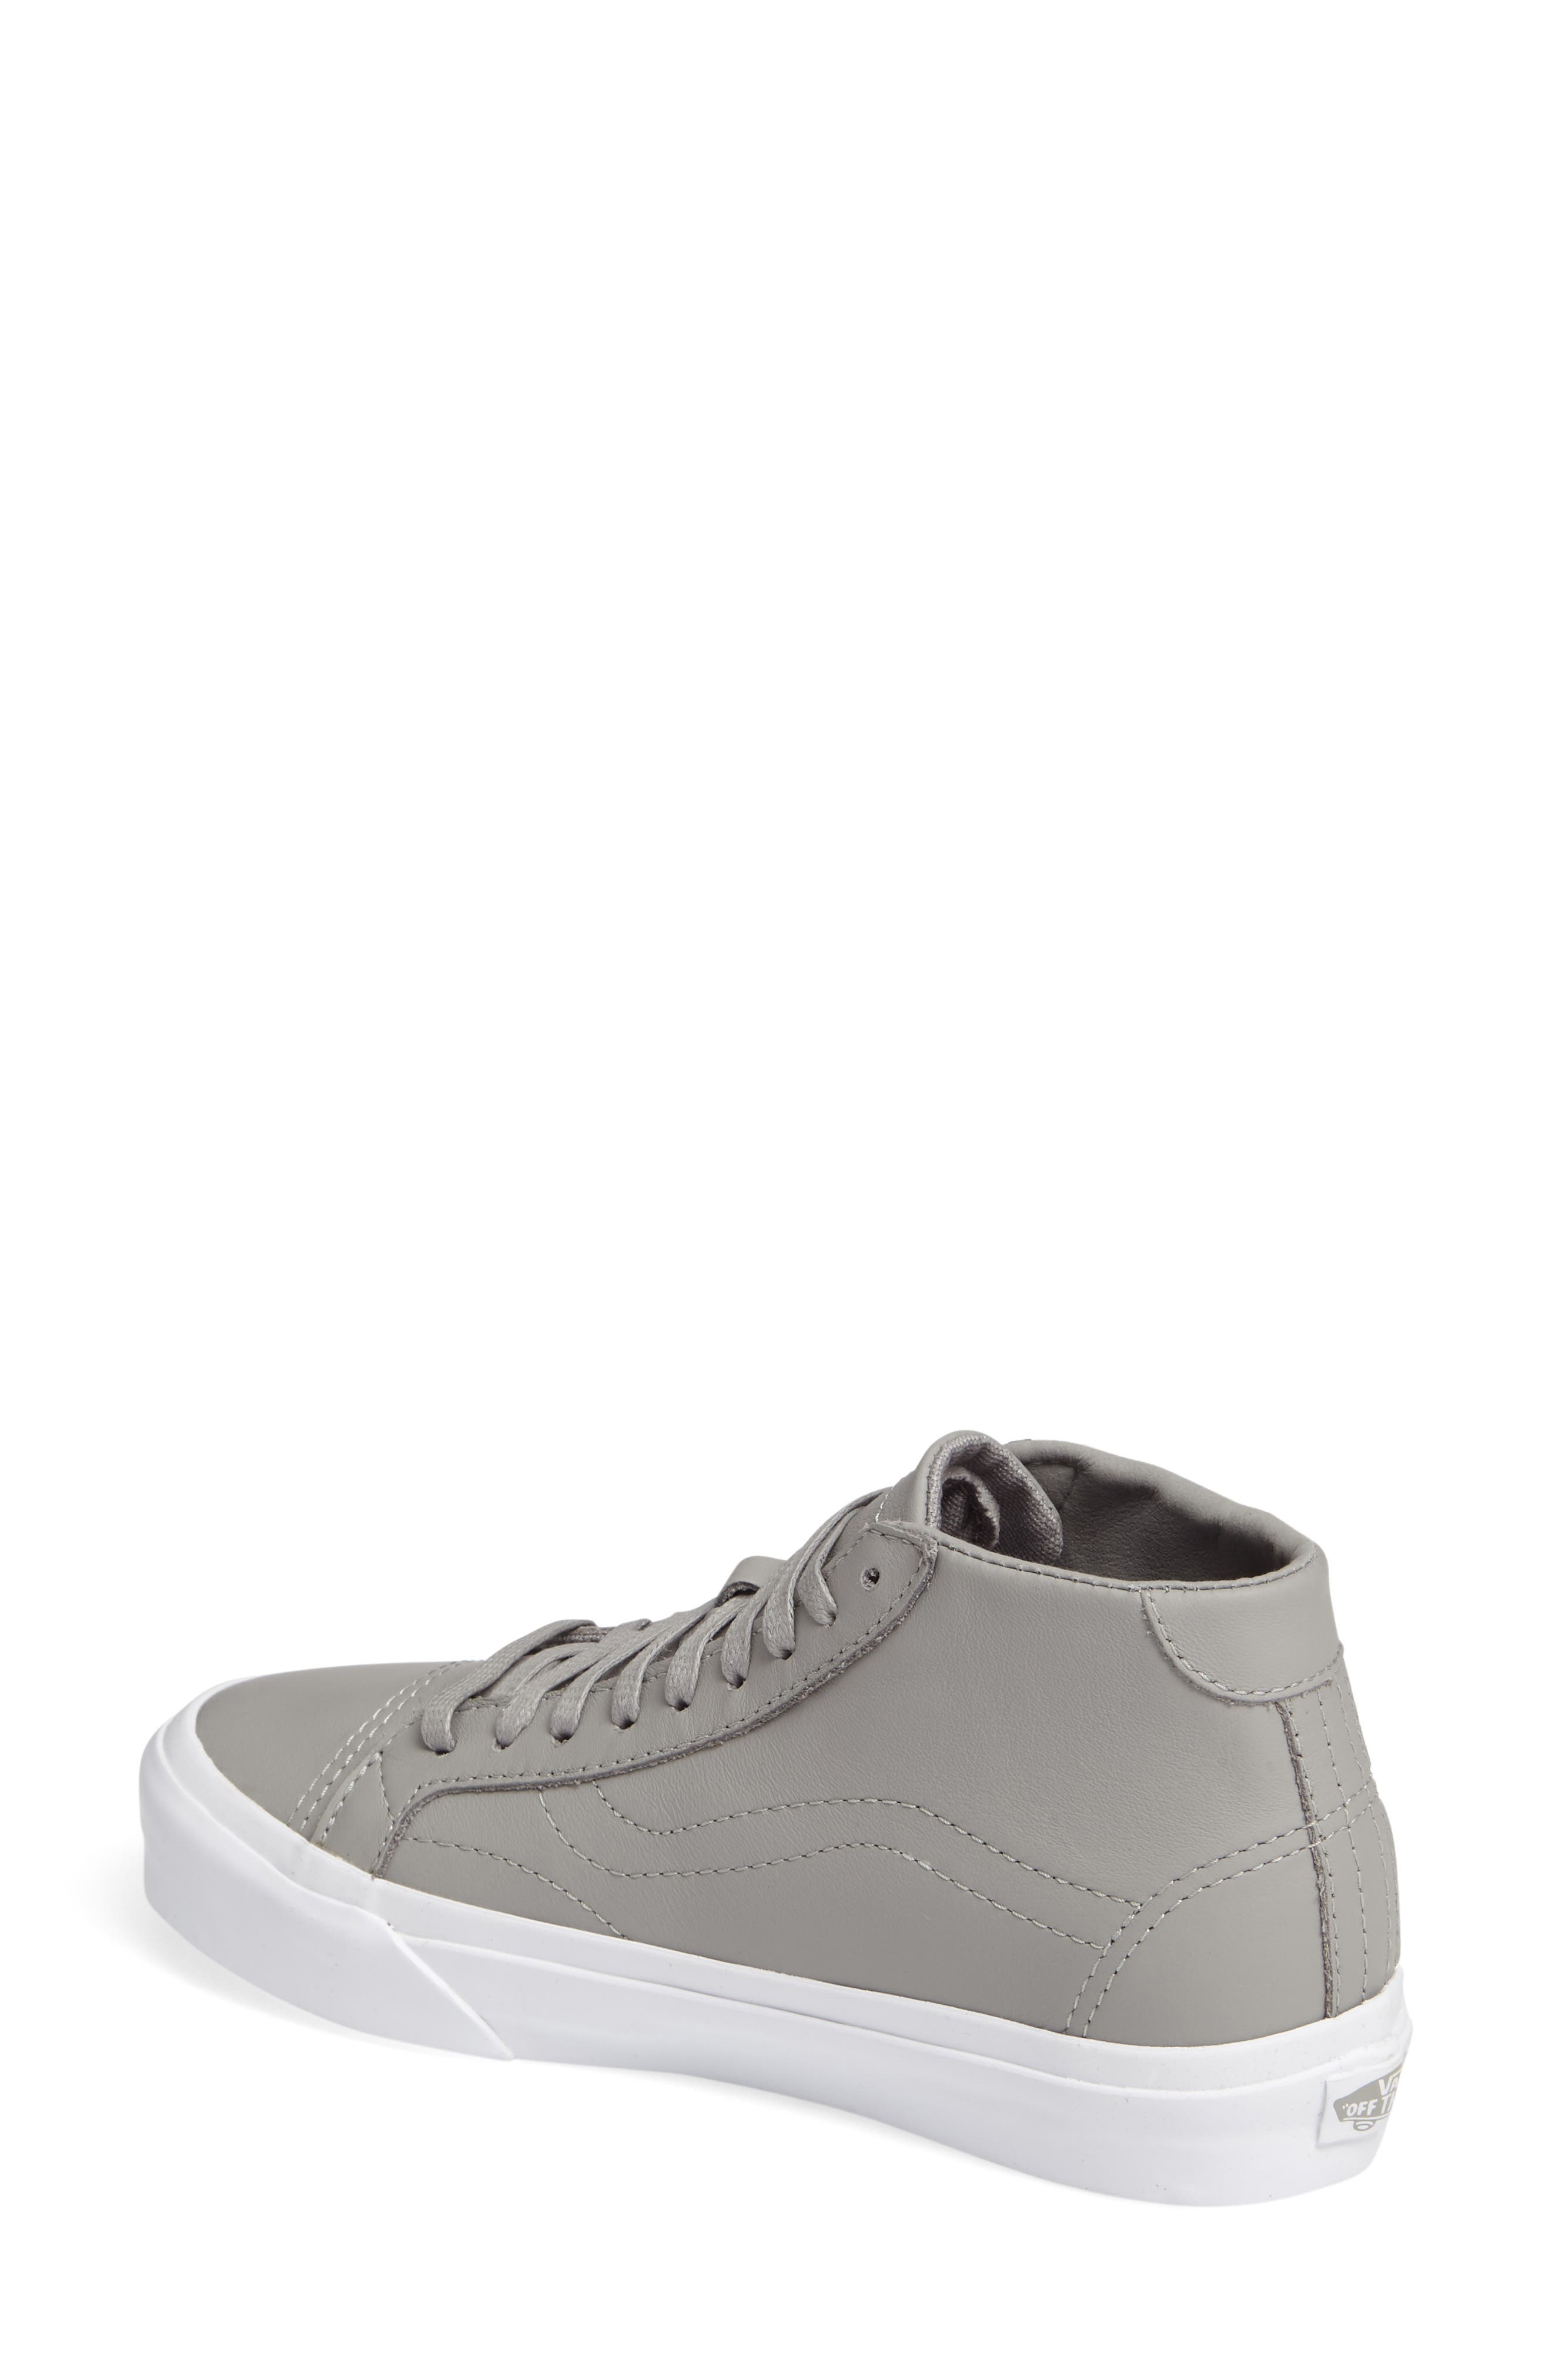 Court DX Mid Sneaker,                             Alternate thumbnail 5, color,